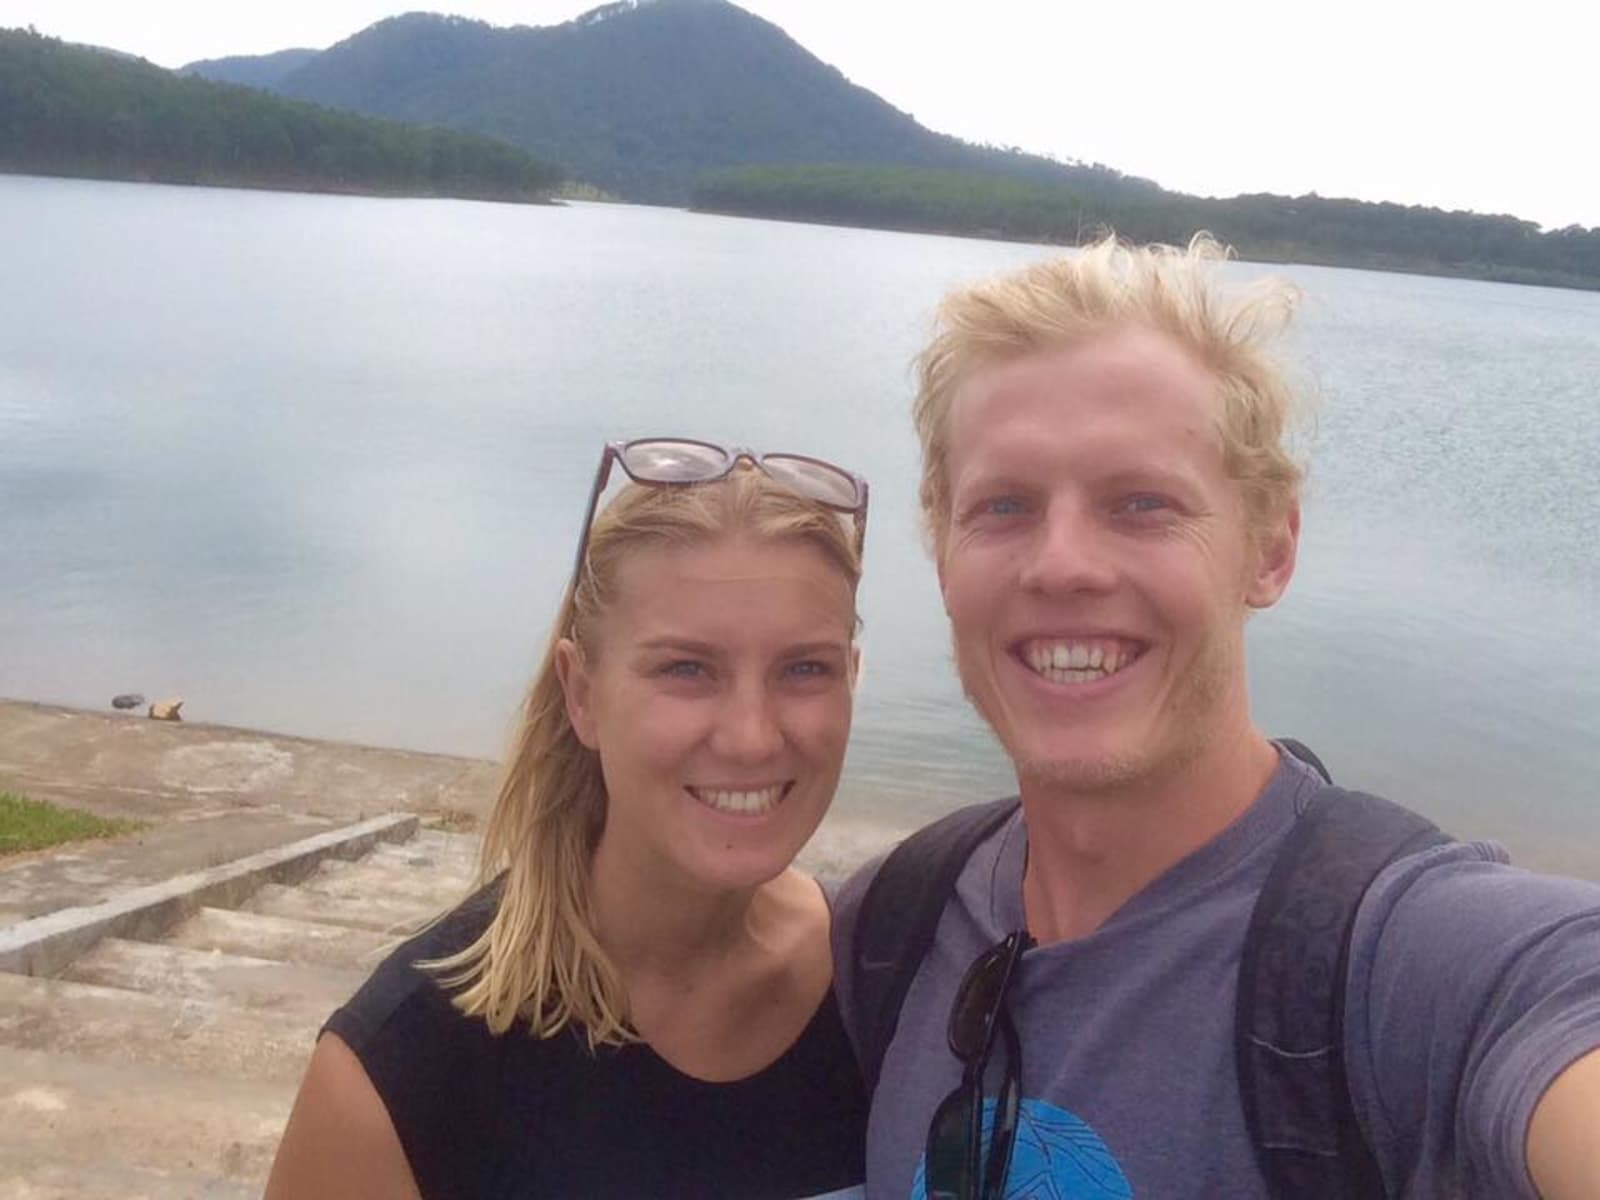 Callum & Suzanne from Munich, Germany